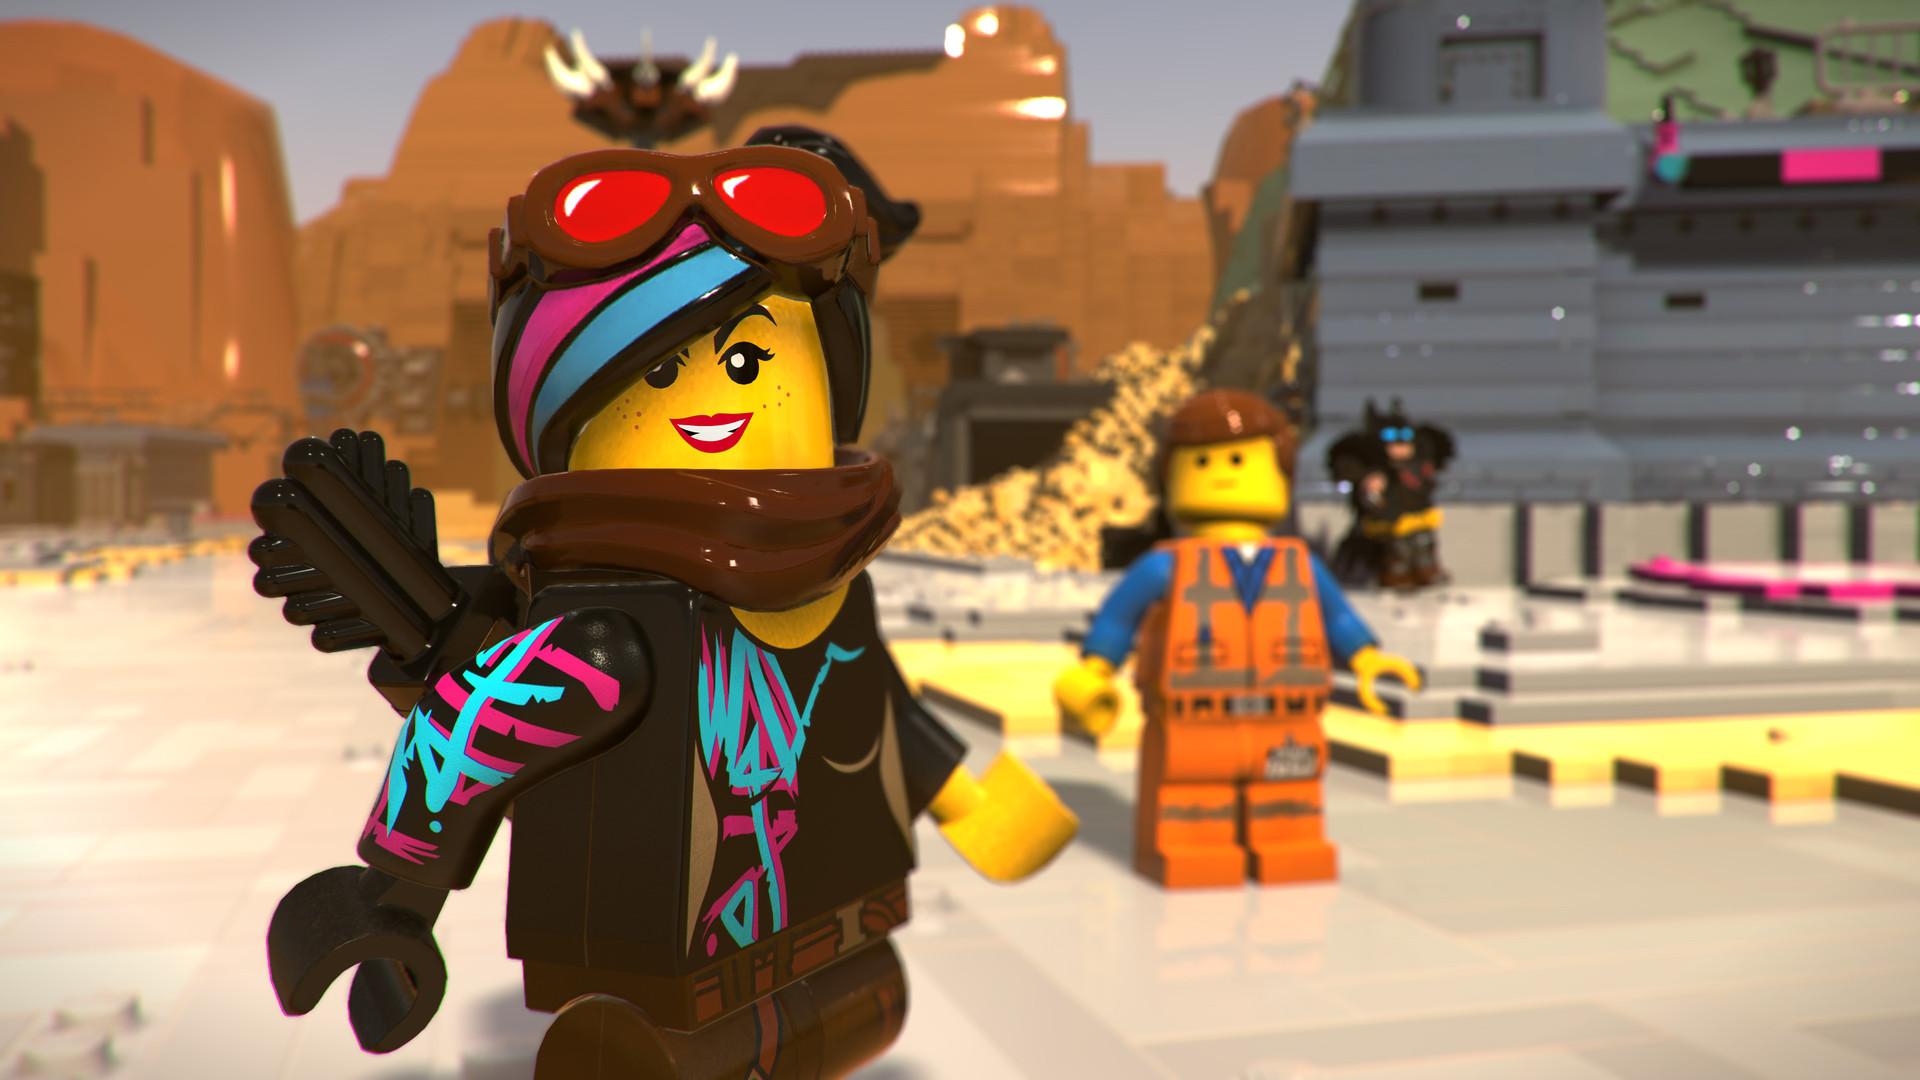 Lego movie video game 2